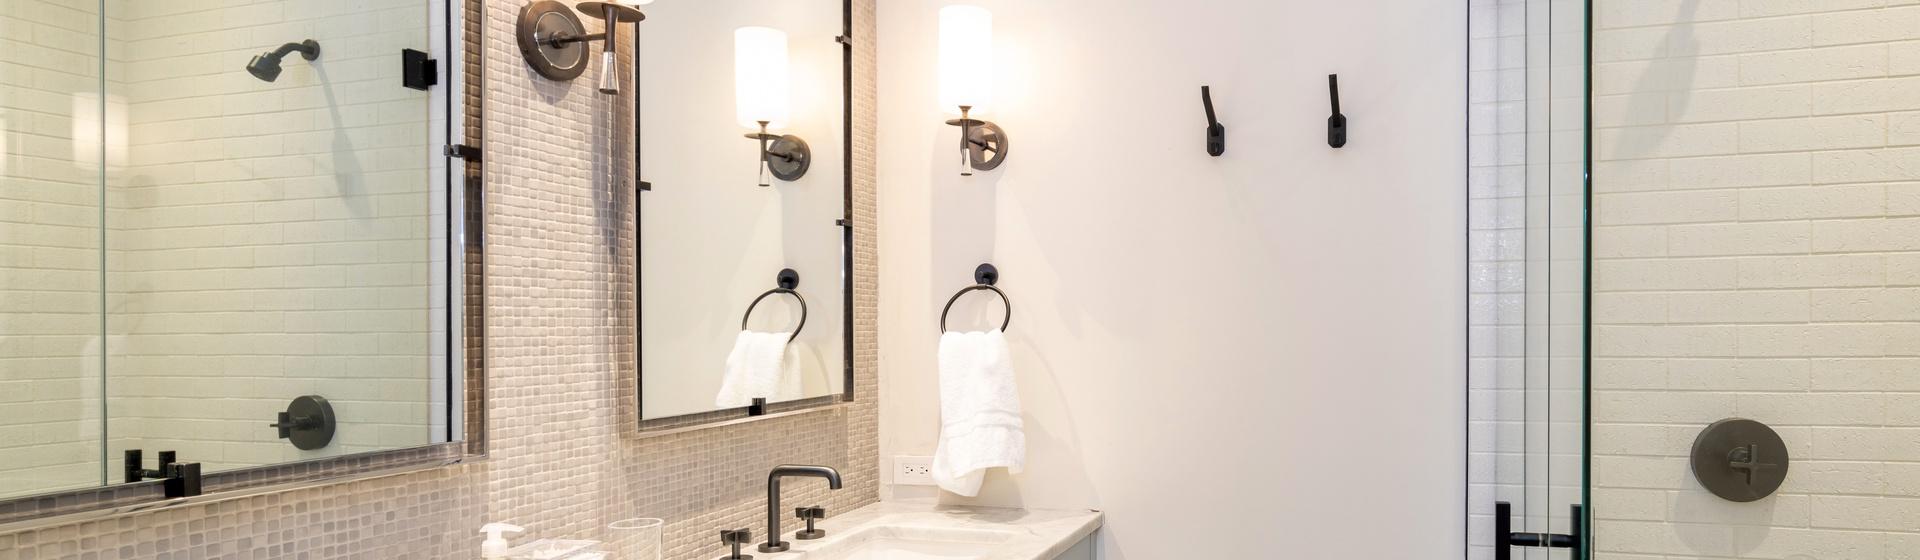 43-Telluride-Vacation-Rental-Cloud-Nine-Cottage-Guest-Bathroom-1